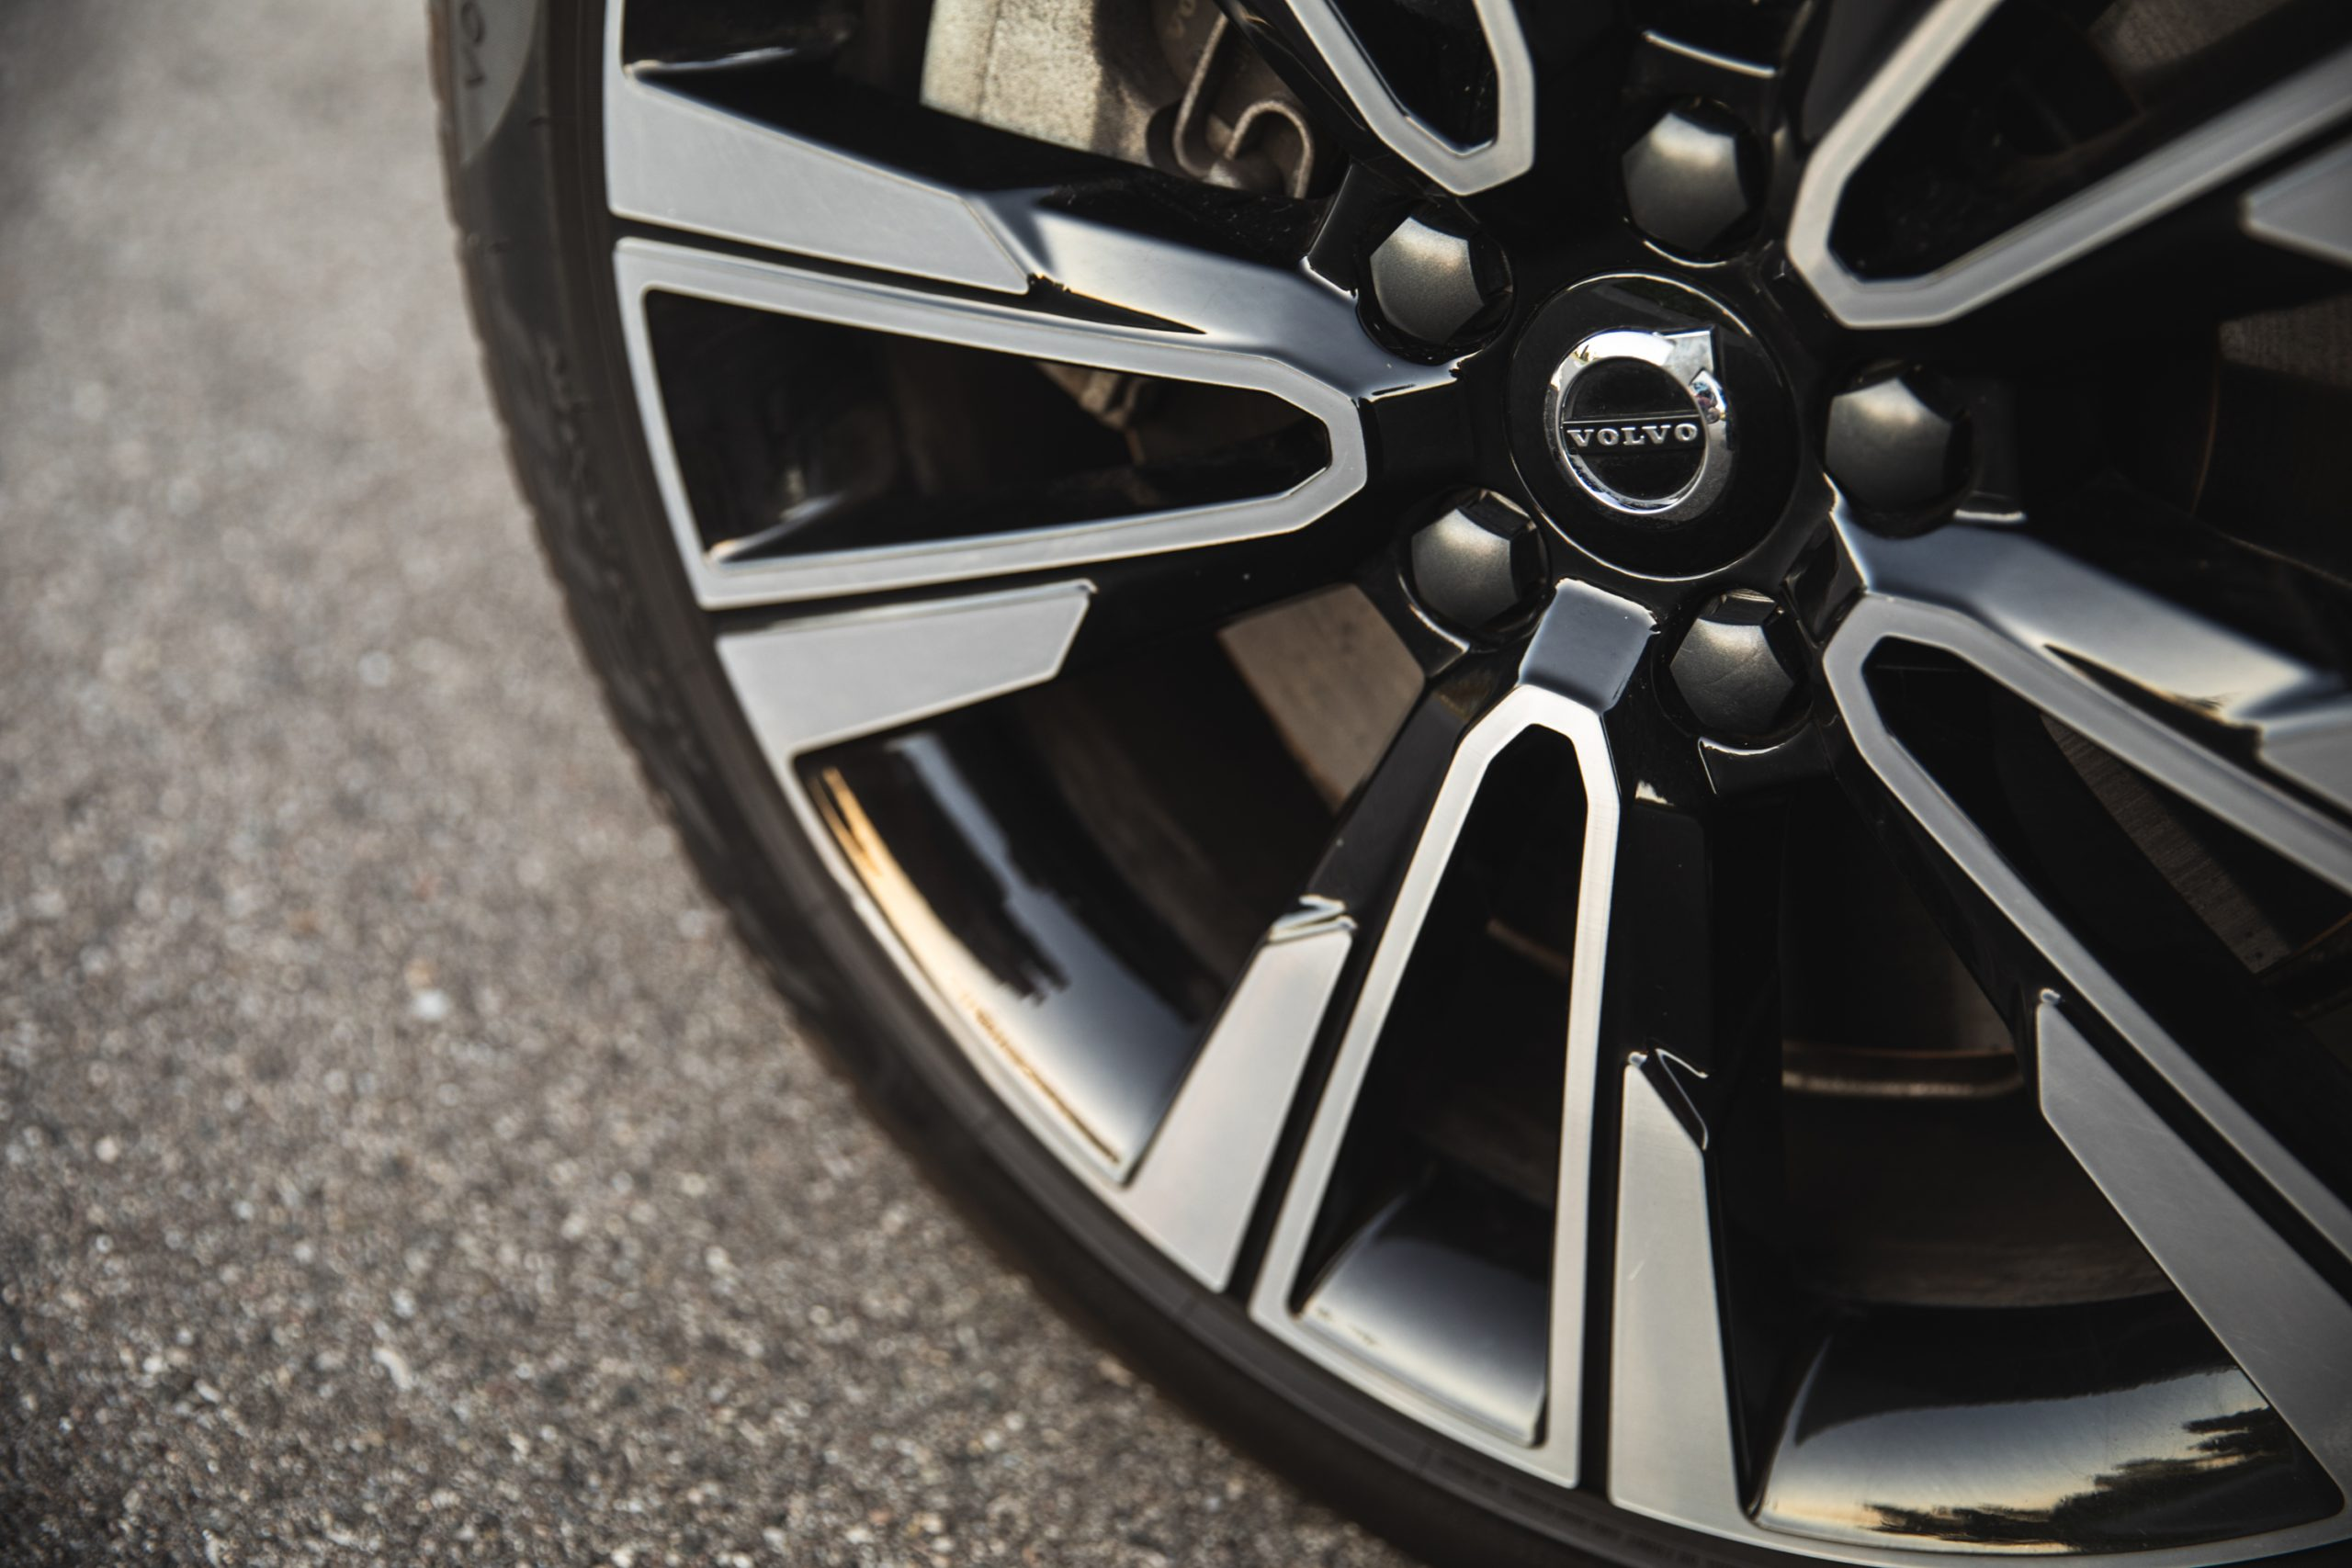 Volvo V60 Cross Country T5 AWD wheel detail